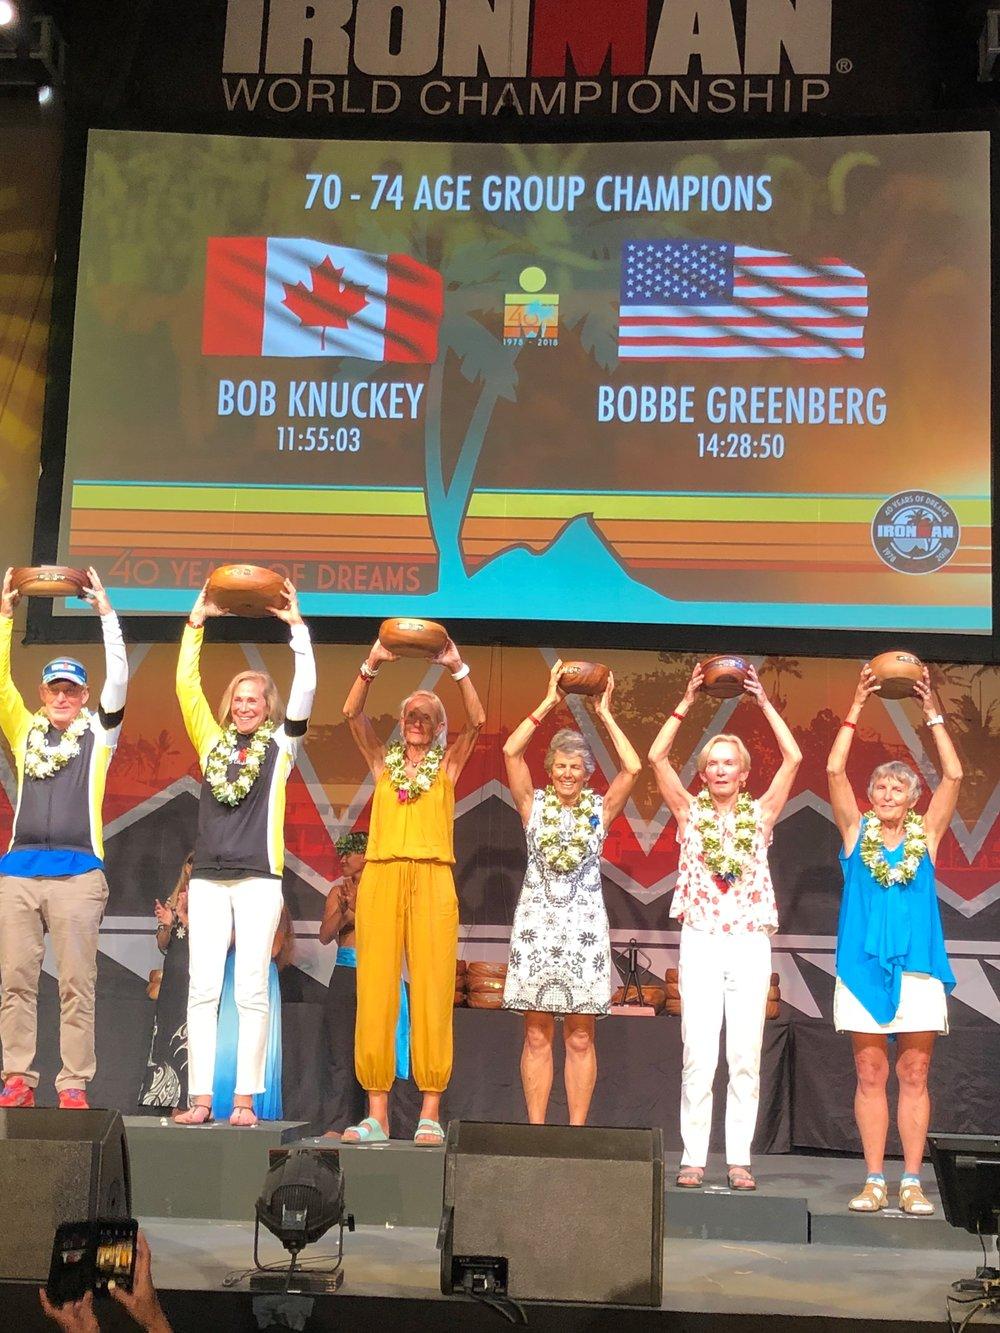 Coach_Terry_Wilson_Pursuit_of_The_Perfect_Race_IRONMAN_World_Championship_Kona_Bobbe_Greenberg_1.jpg